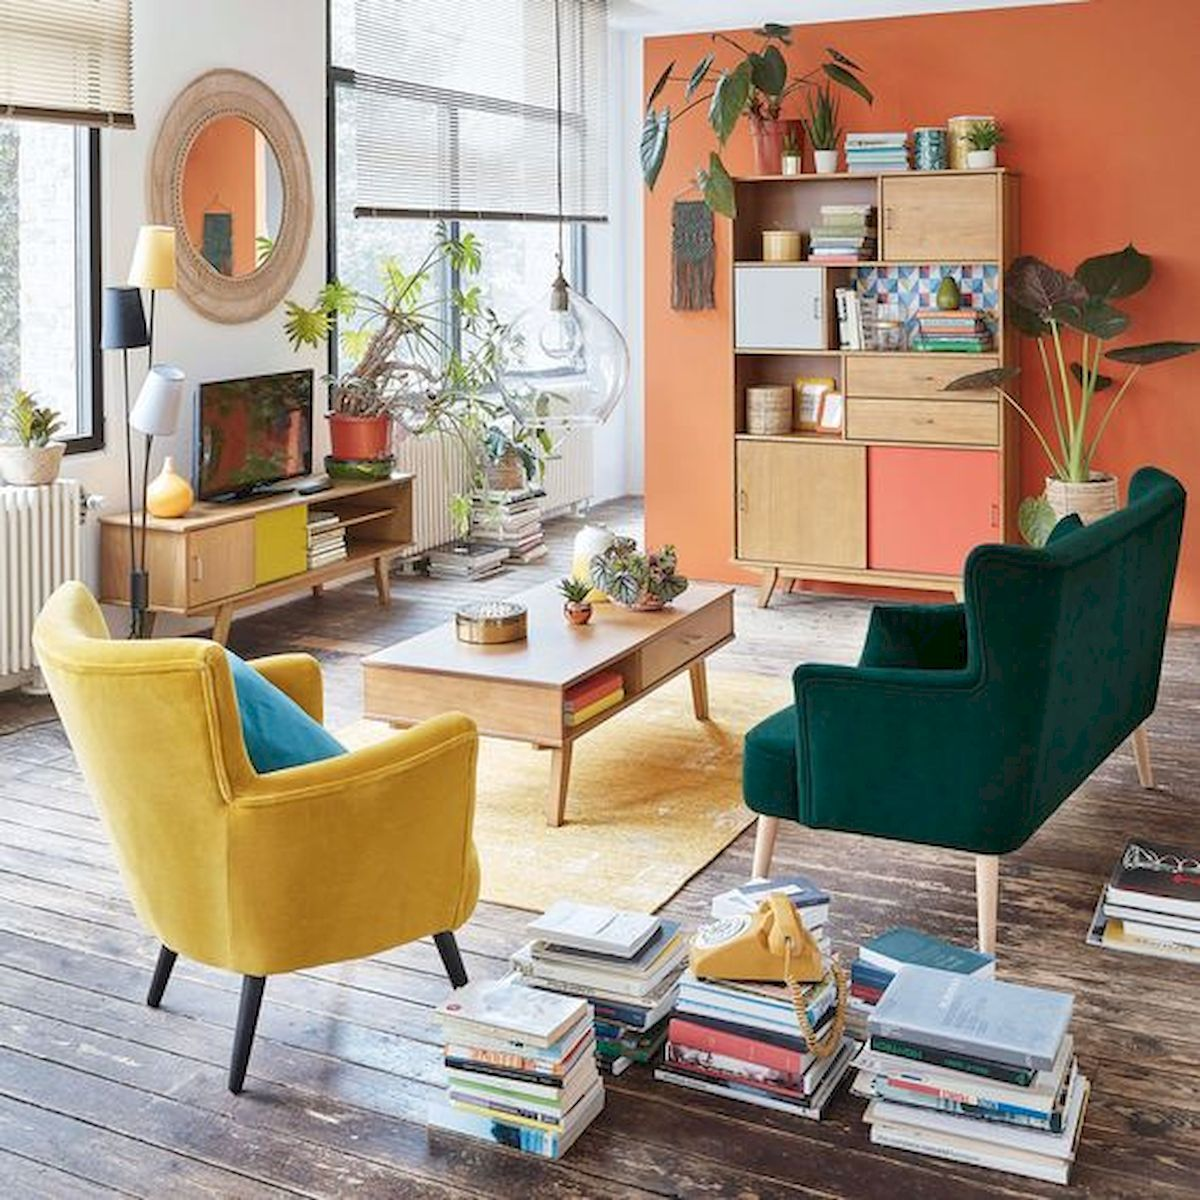 80 Excellent Vintage Living Room Decor Ideas And Remodel Vin